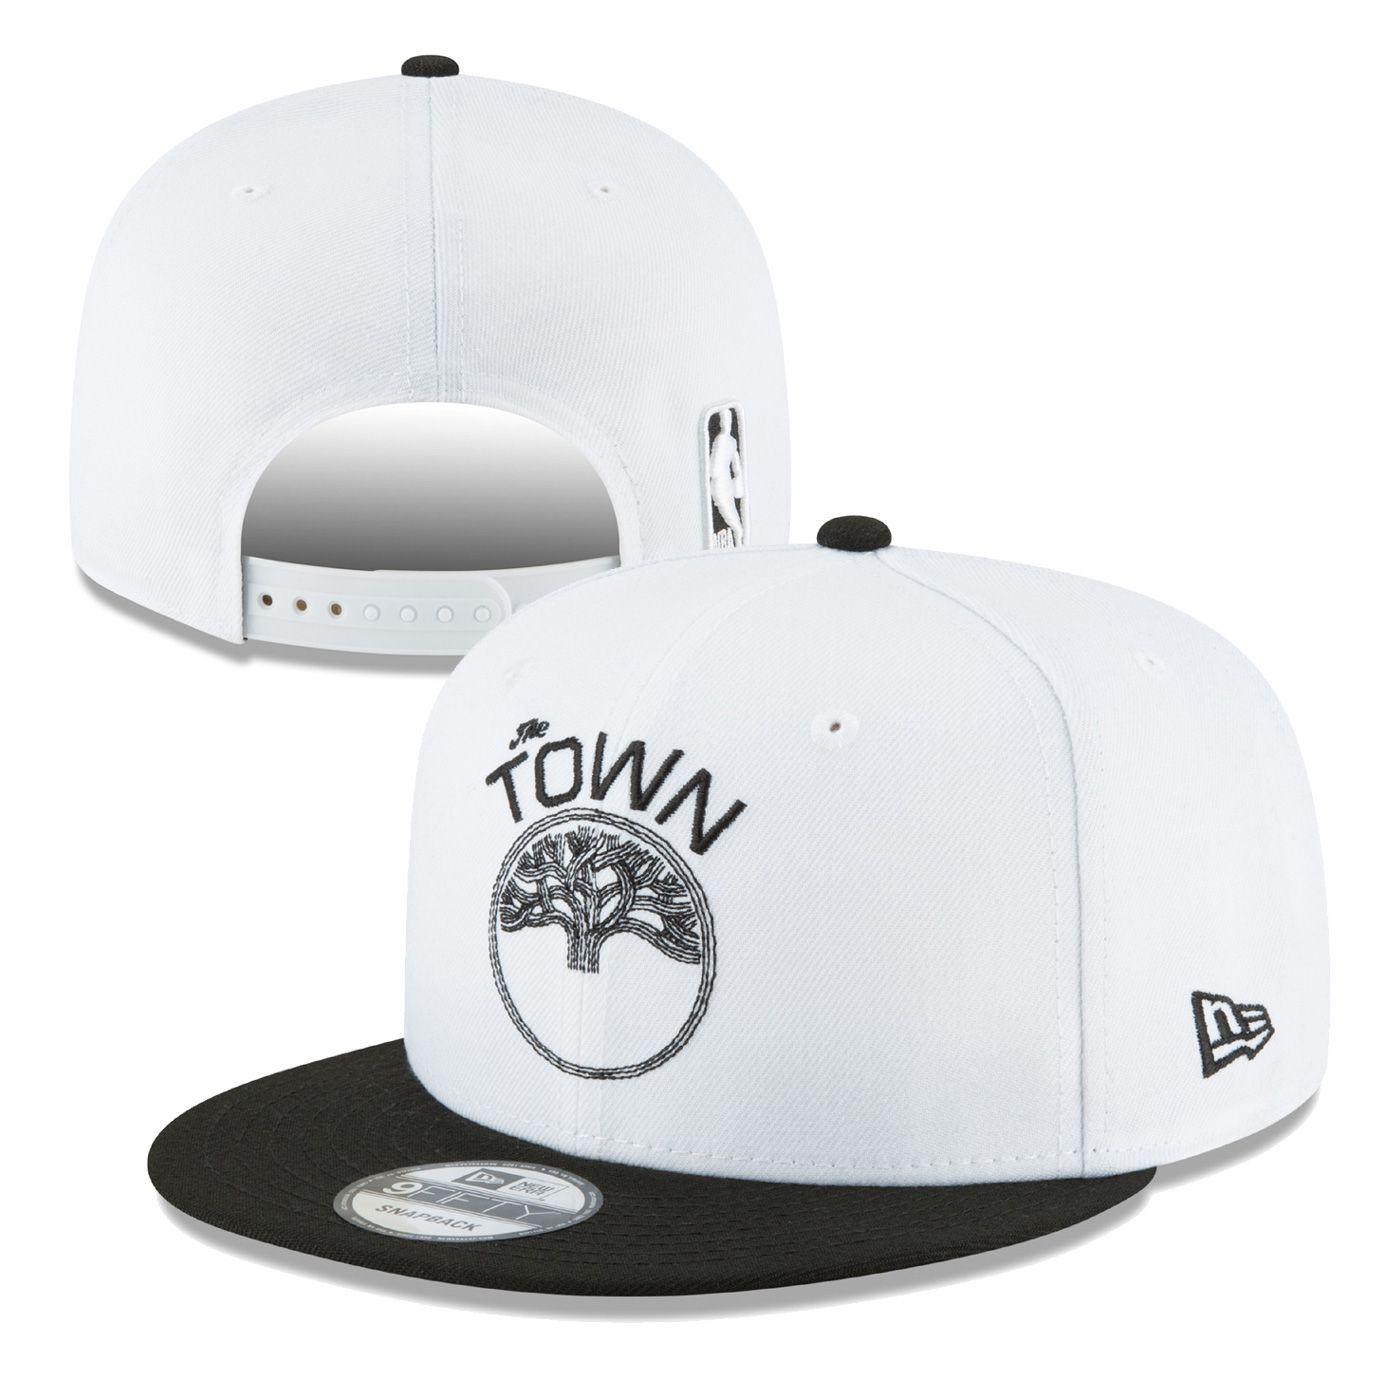 new style 4b68b df359 Golden State Warriors New Era  The Town  Full Logo 9FIFTY Snapback -  White Black